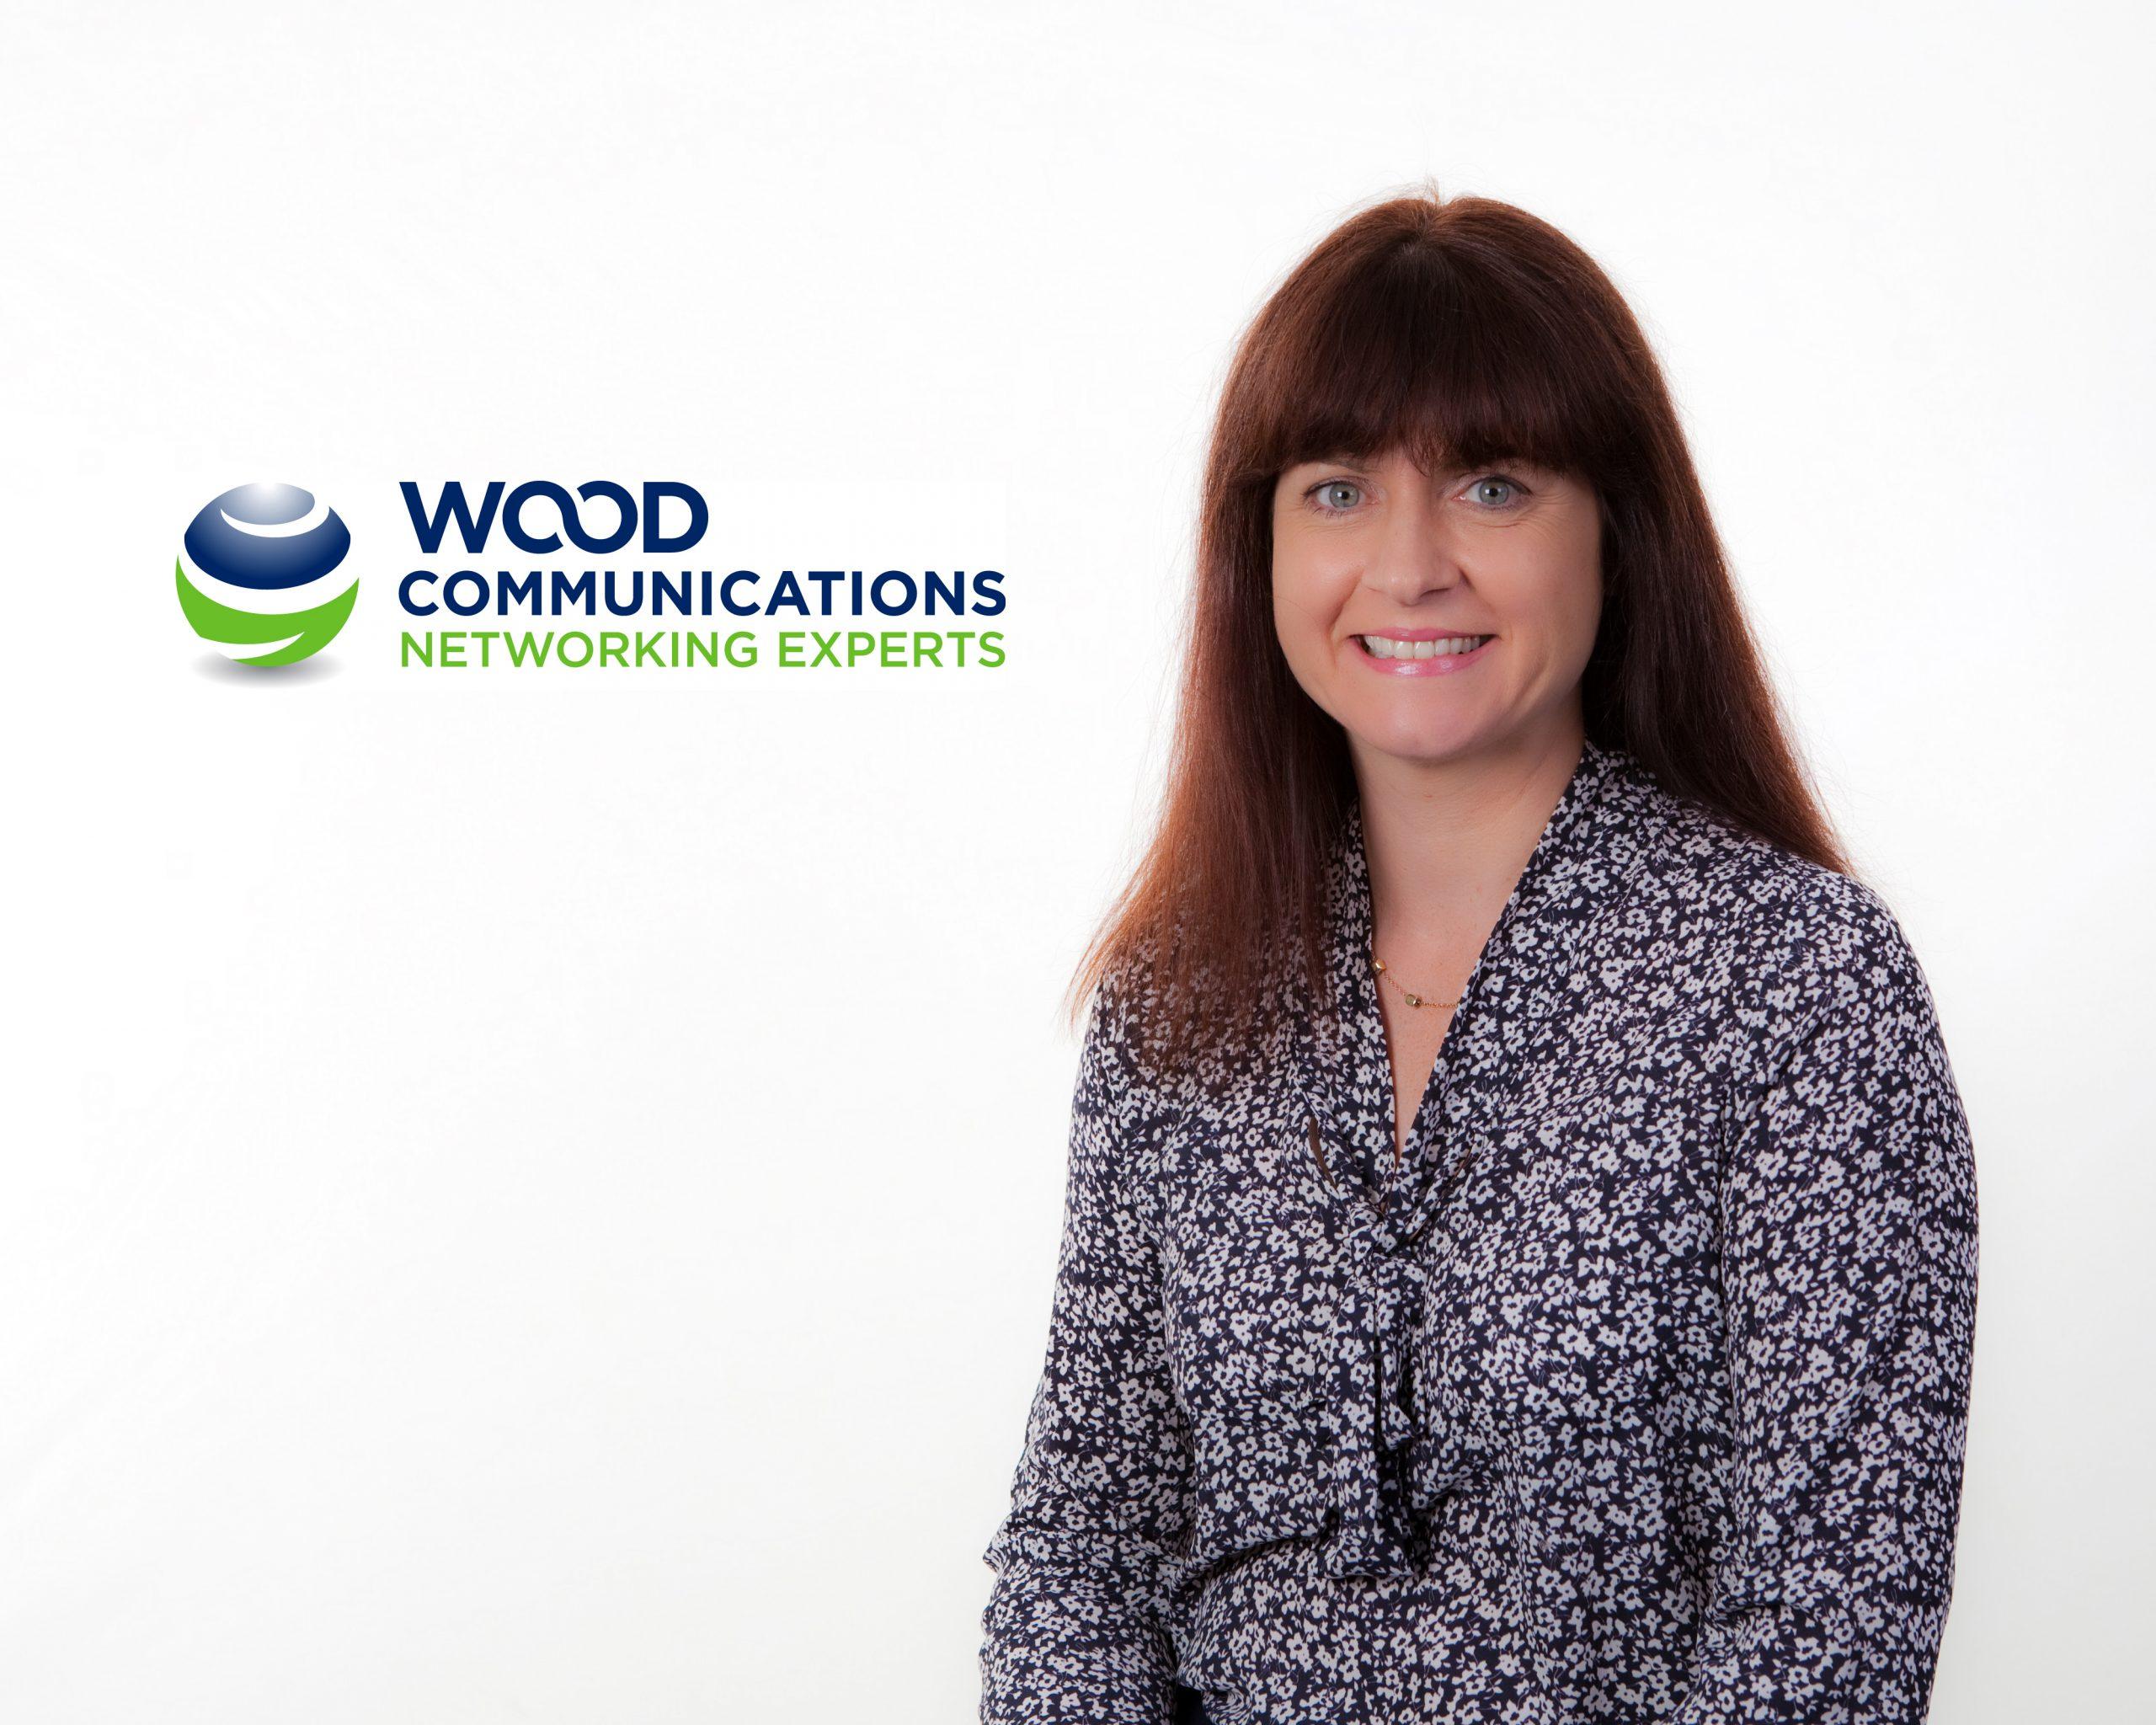 7. Levene Howlett - wood communications networking expert